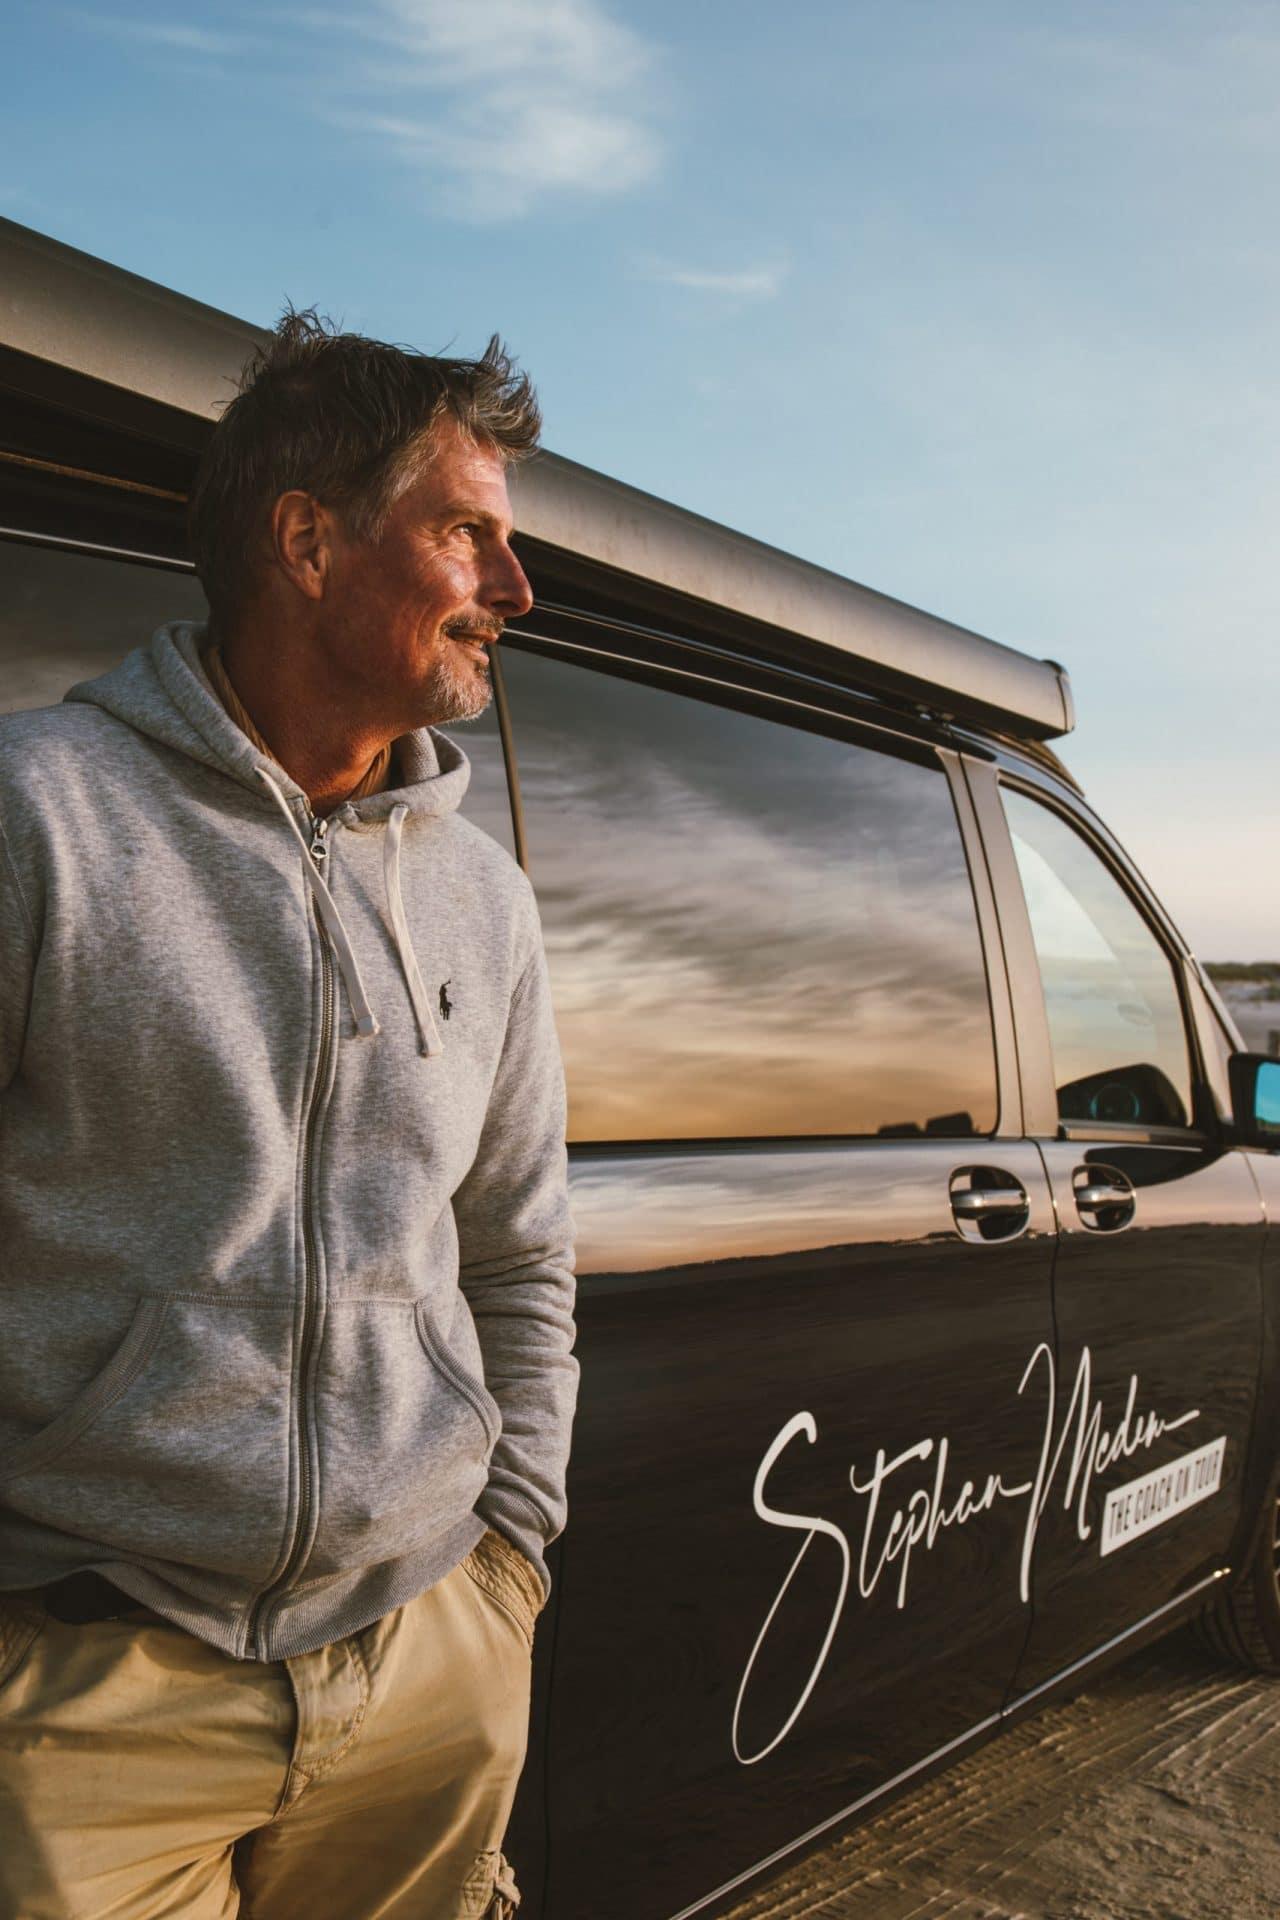 Stephan Medem vor einem Van - Coach on Tour